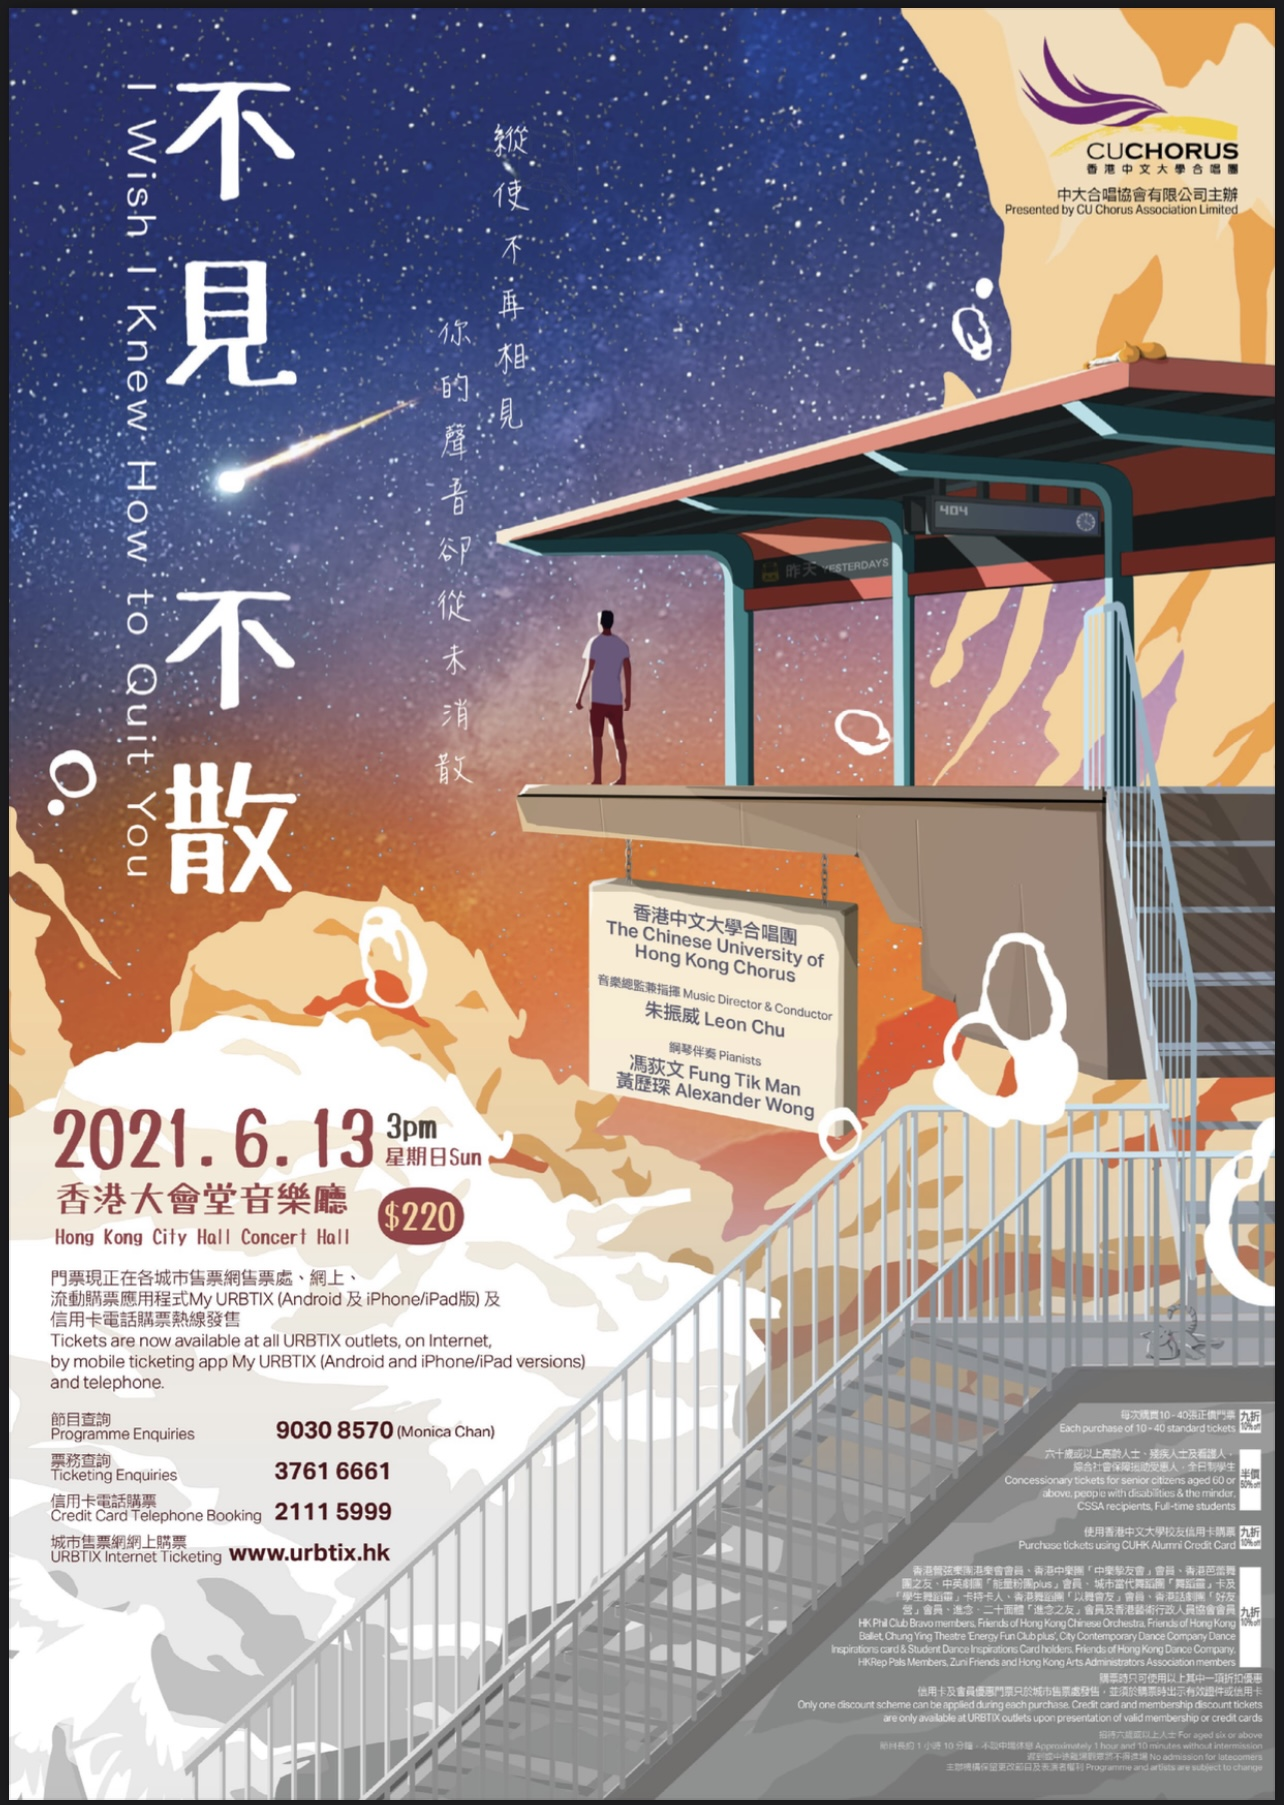 CU Chorus 2021 Concert Leaflet